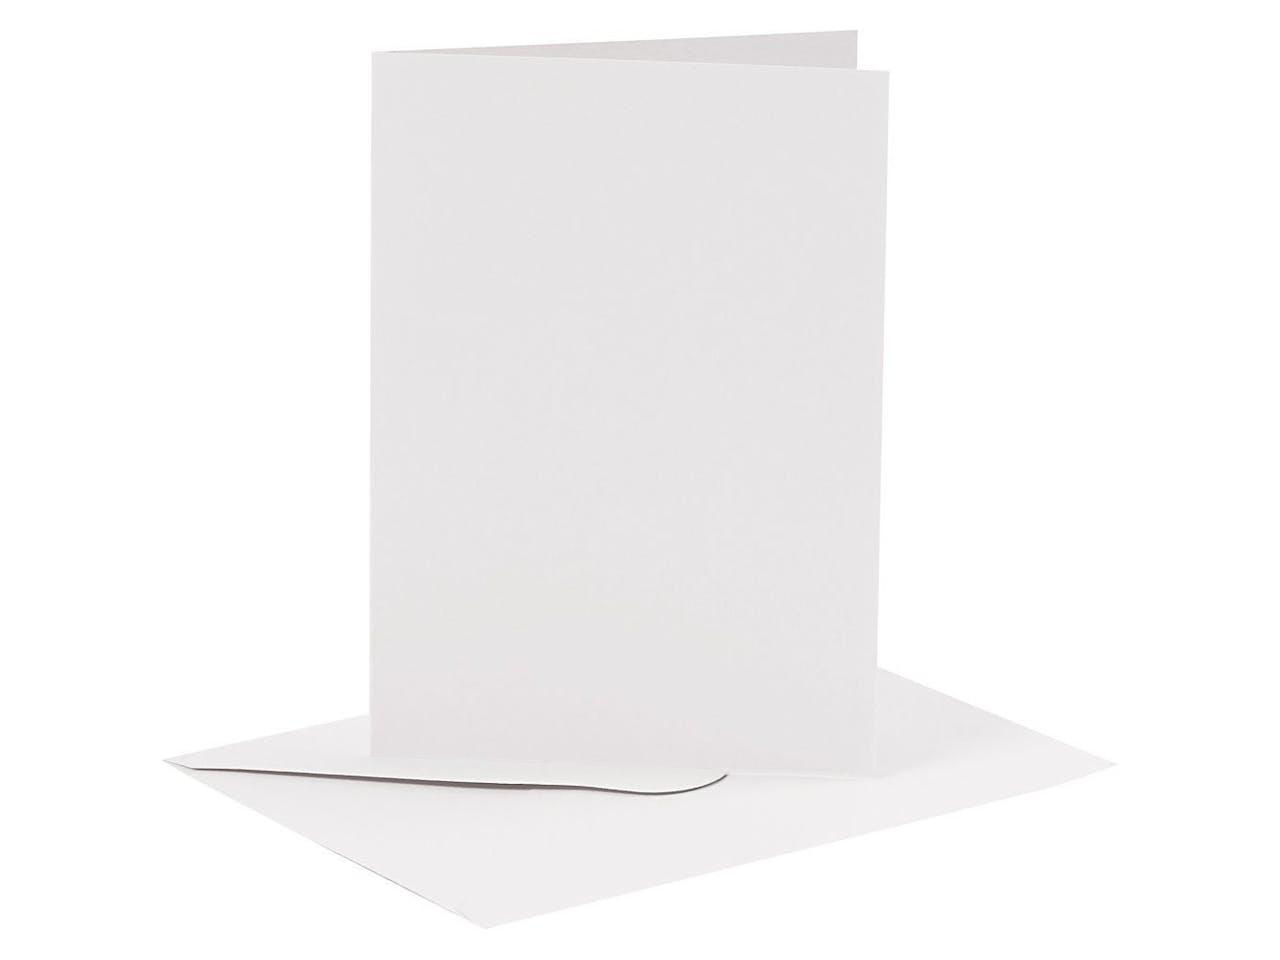 Blankokarten-Set, je 6 Klappkarten A6 & Kuverts C6, weiß